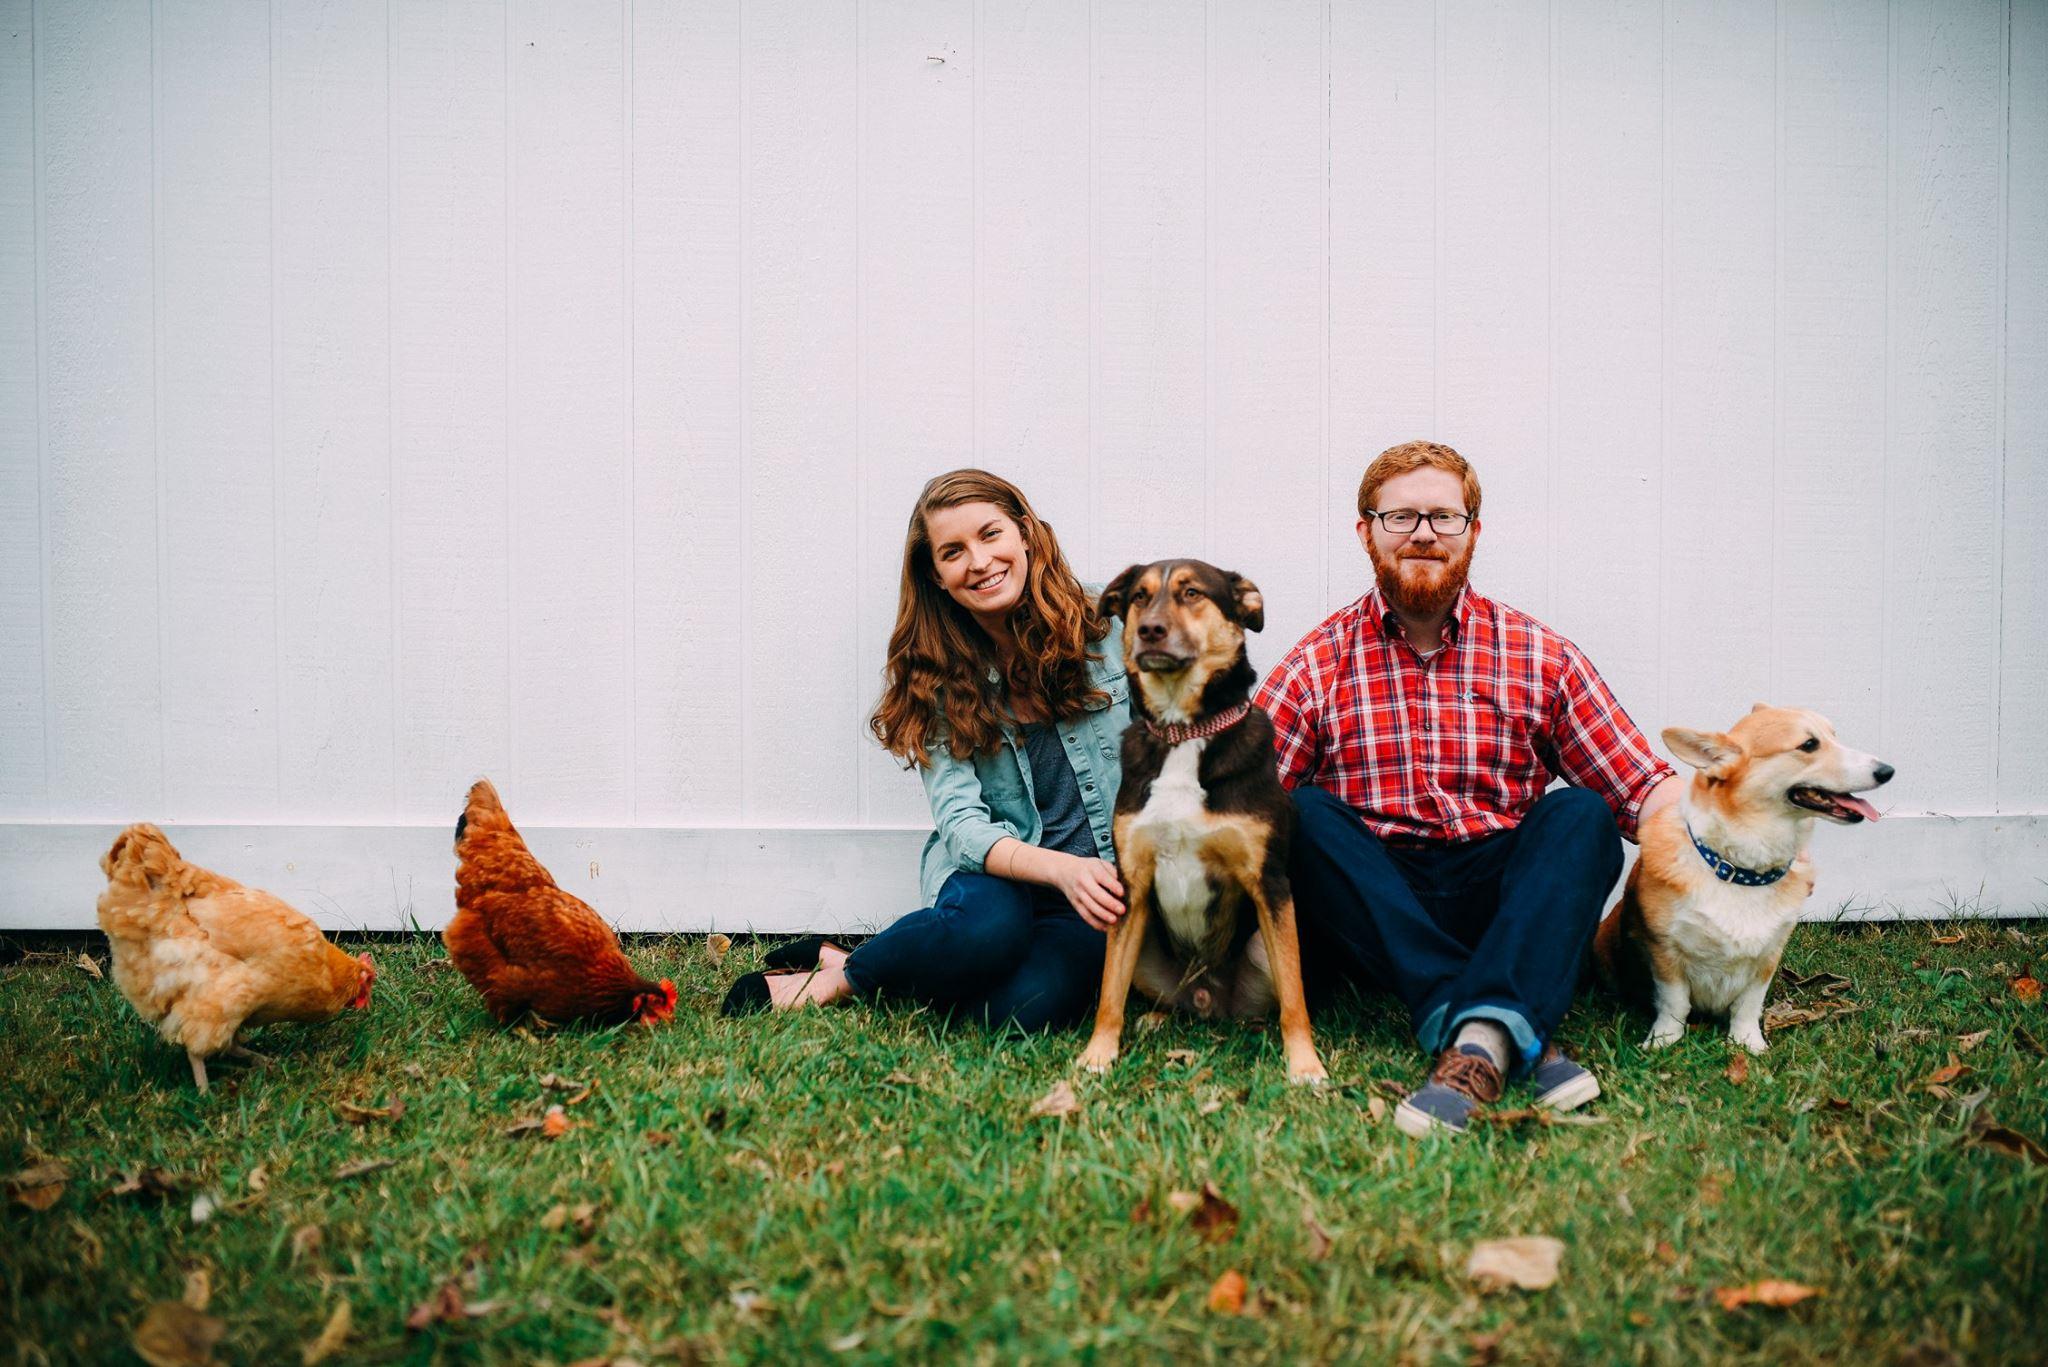 raleigh family photographer - nashville photographer - north carolina family photographer